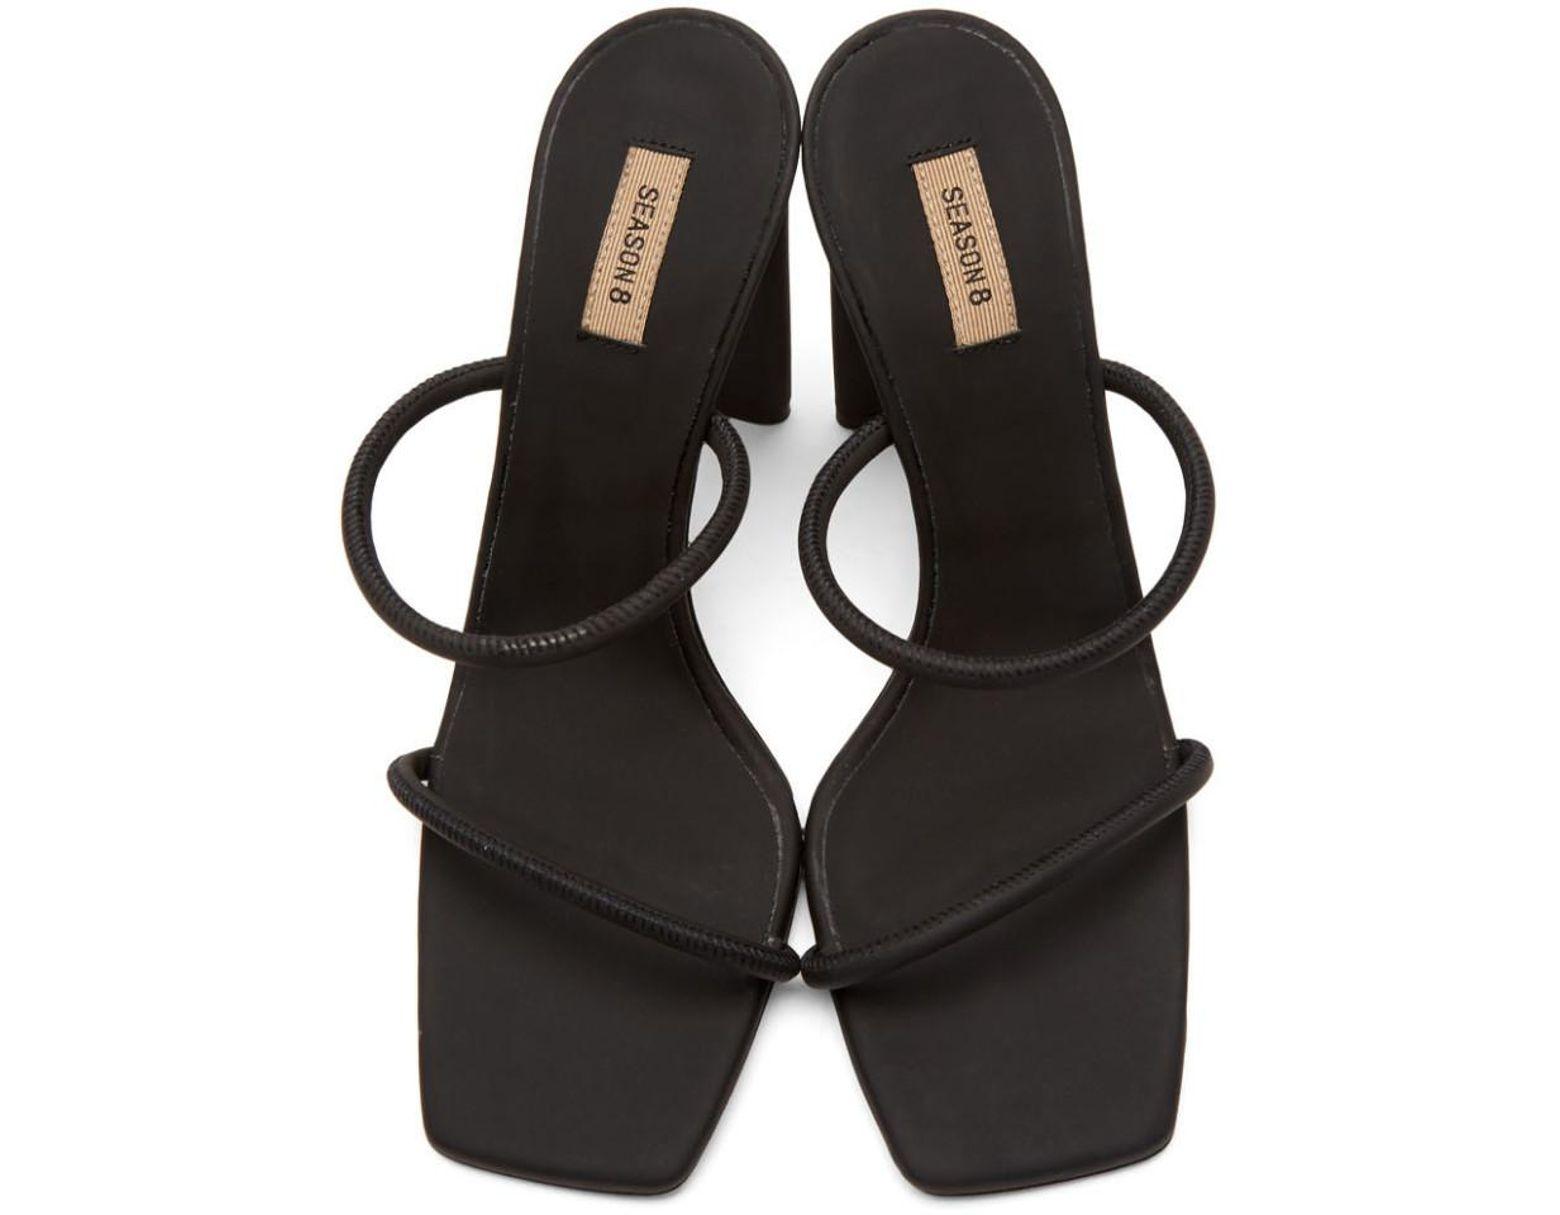 649198e17 Yeezy Black Minimal Heel Sandals in Black - Save 17% - Lyst